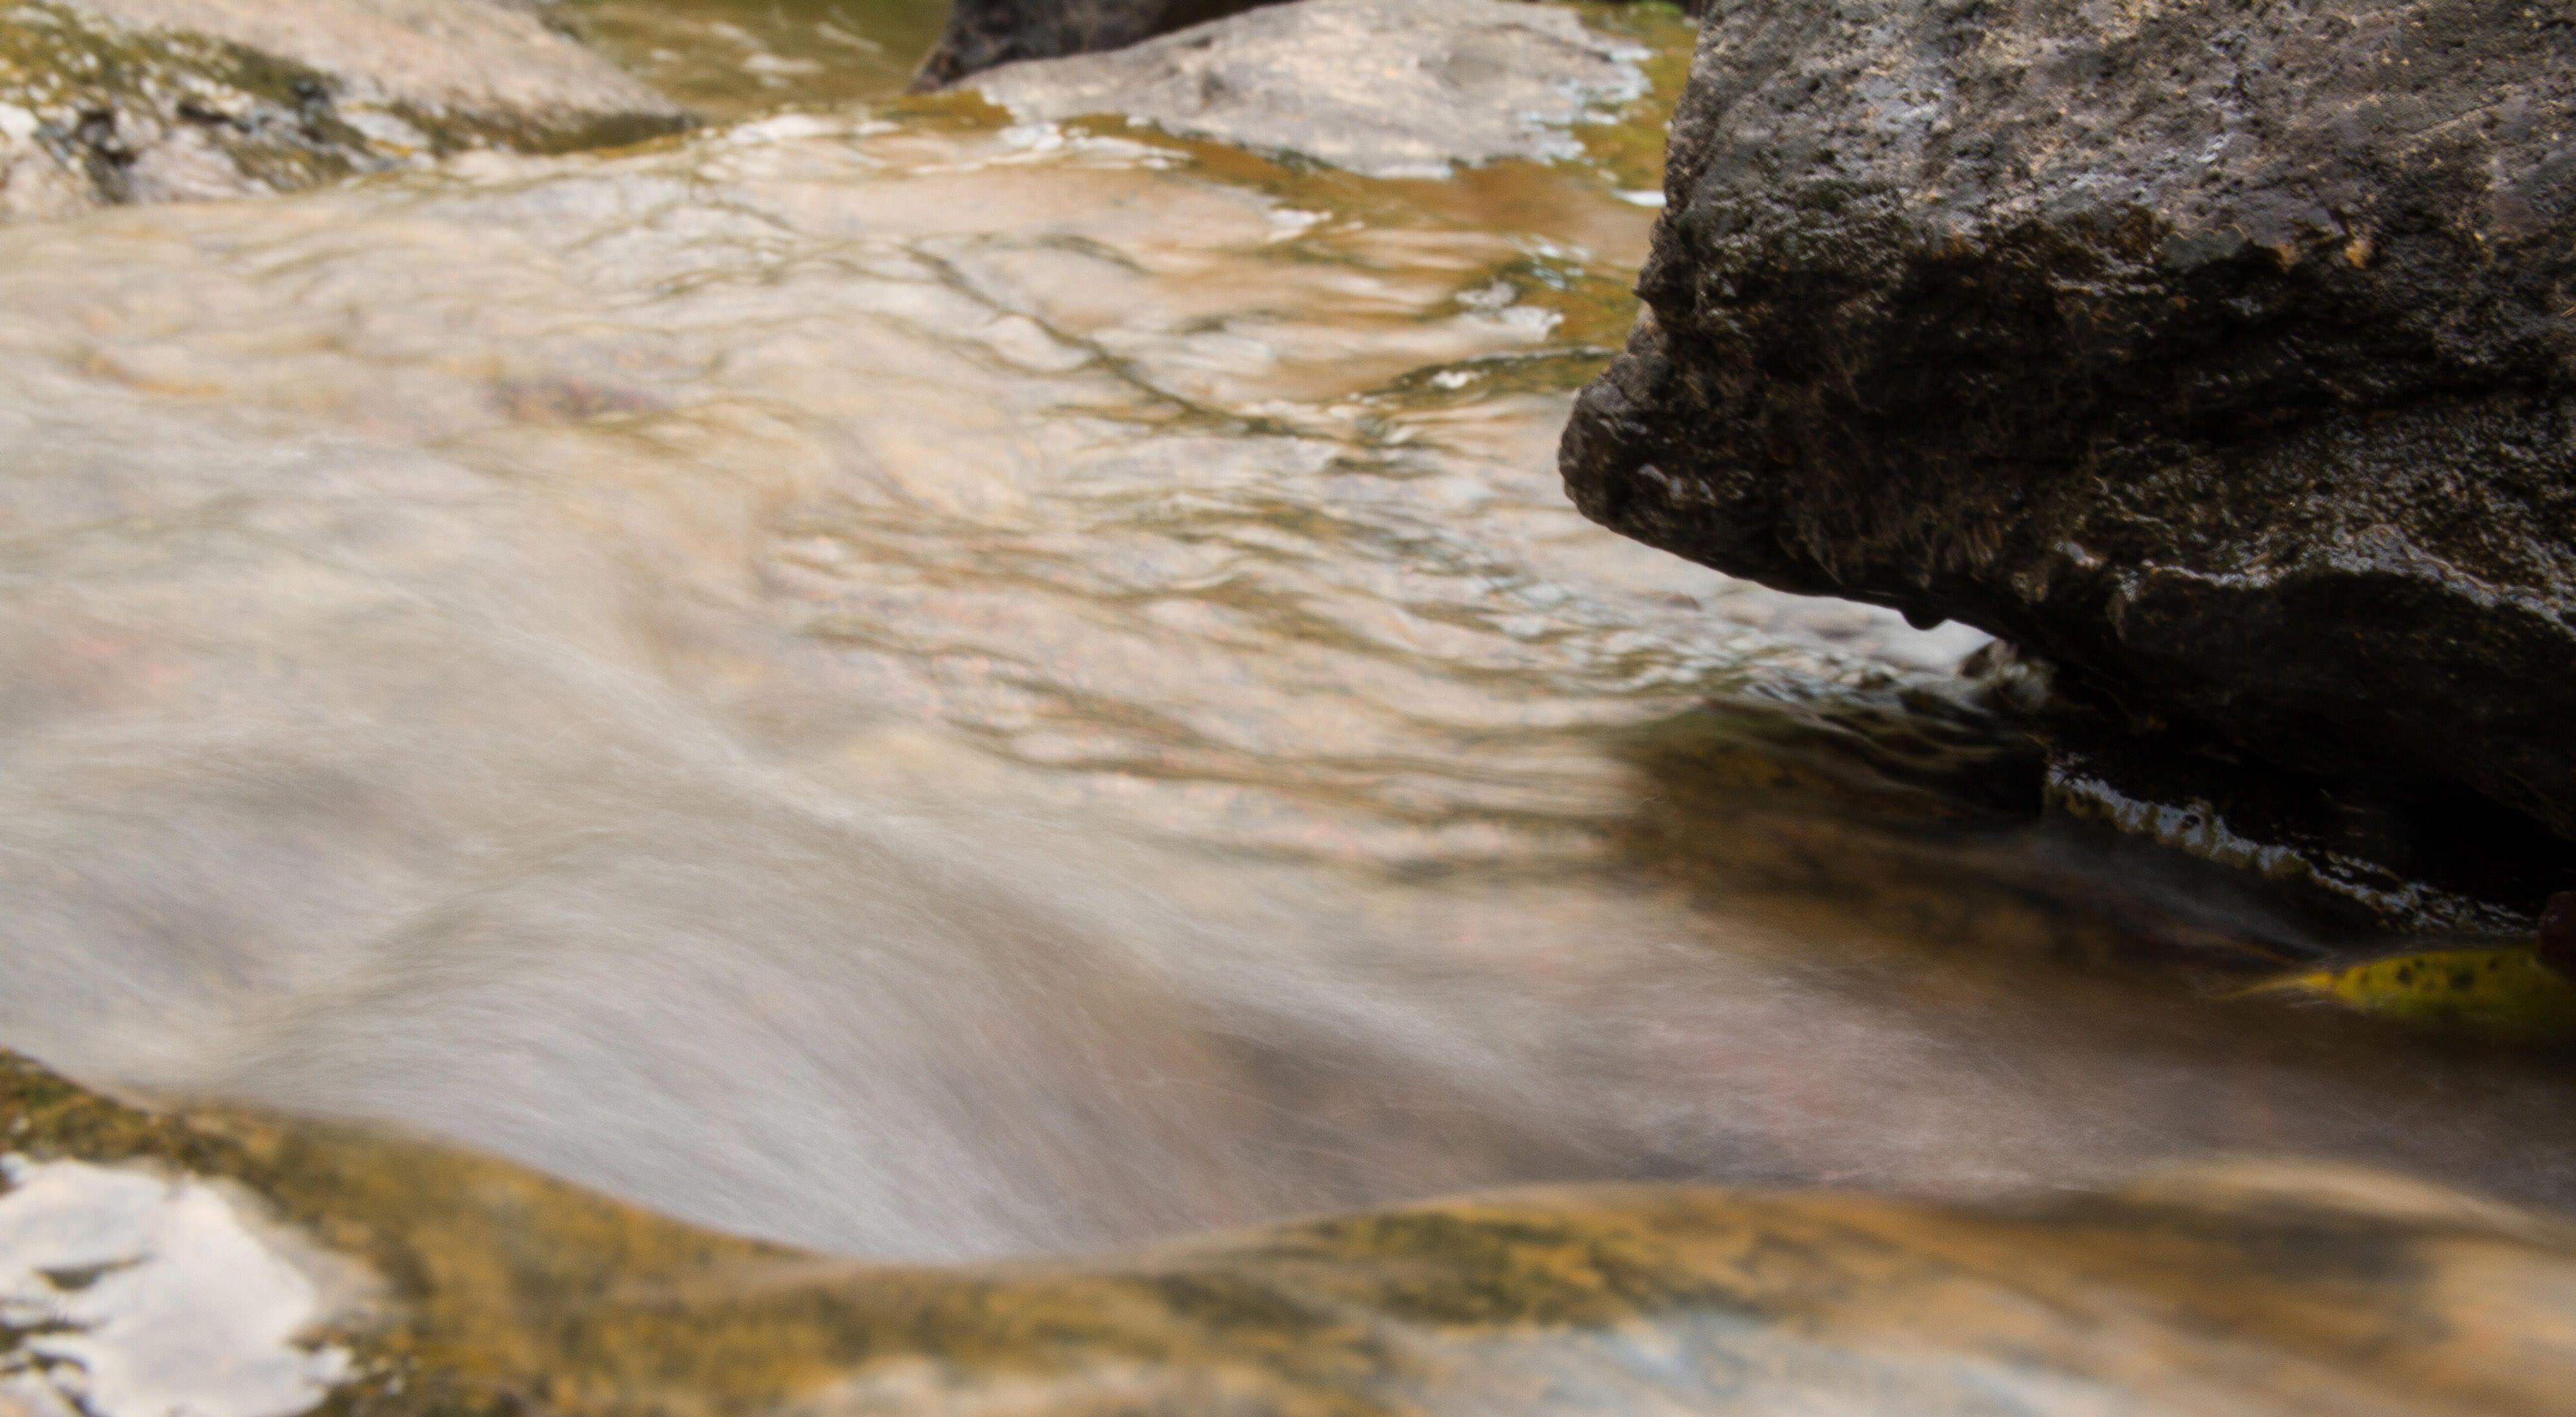 Água no Rio Jaguari, em Extrema-MG.